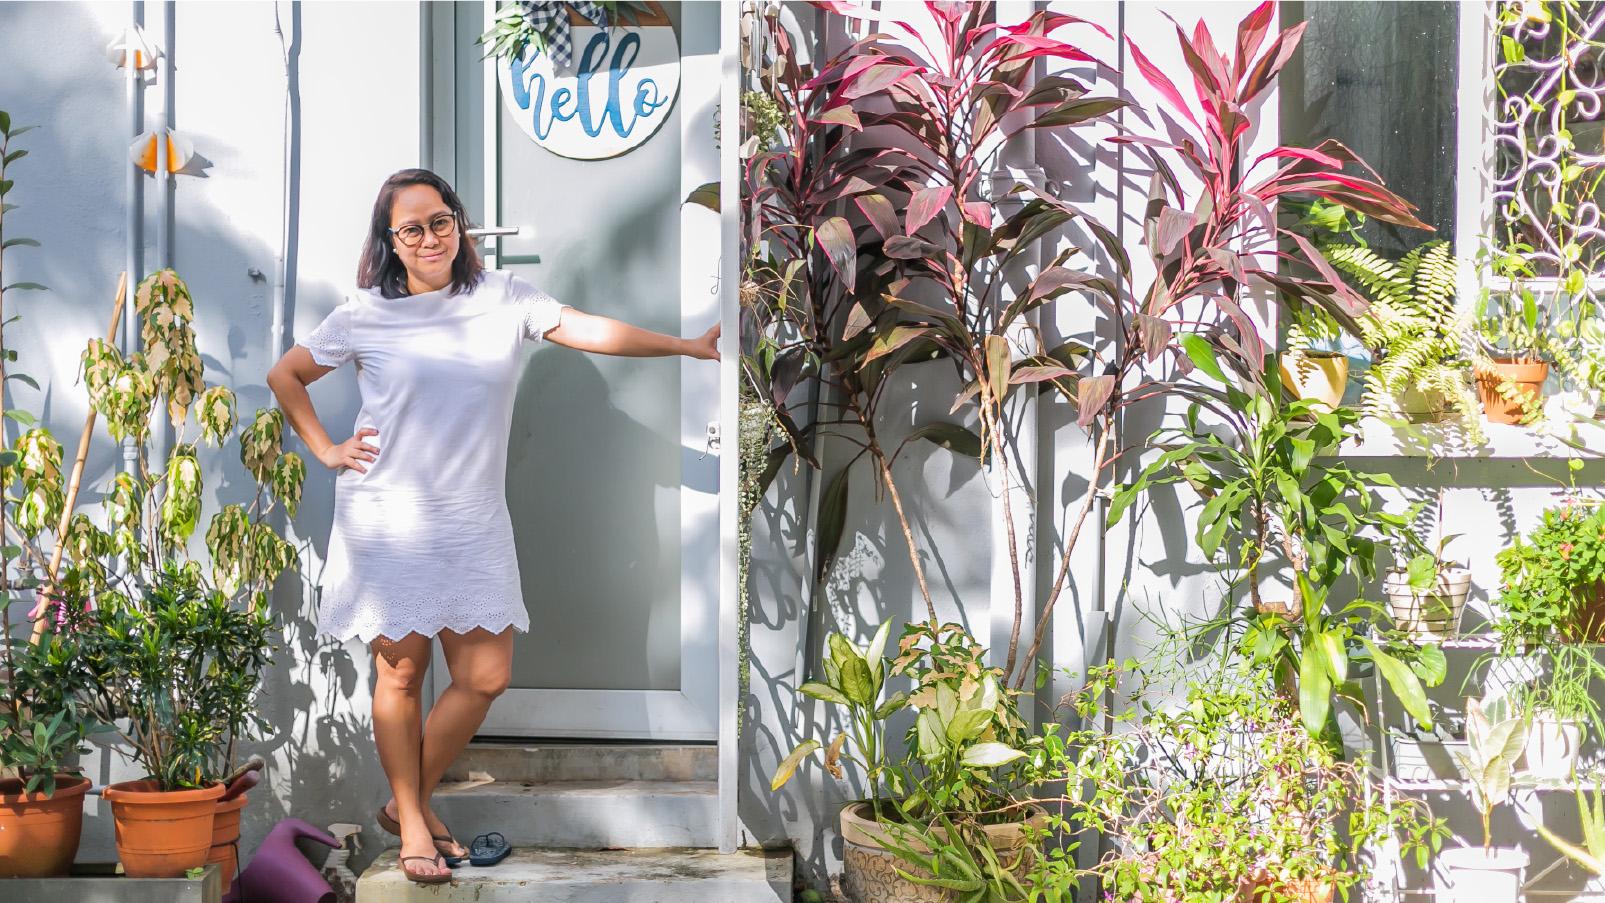 Turning A Plain Shophouse Yard Into An Instagram-Worthy 'Jungle'